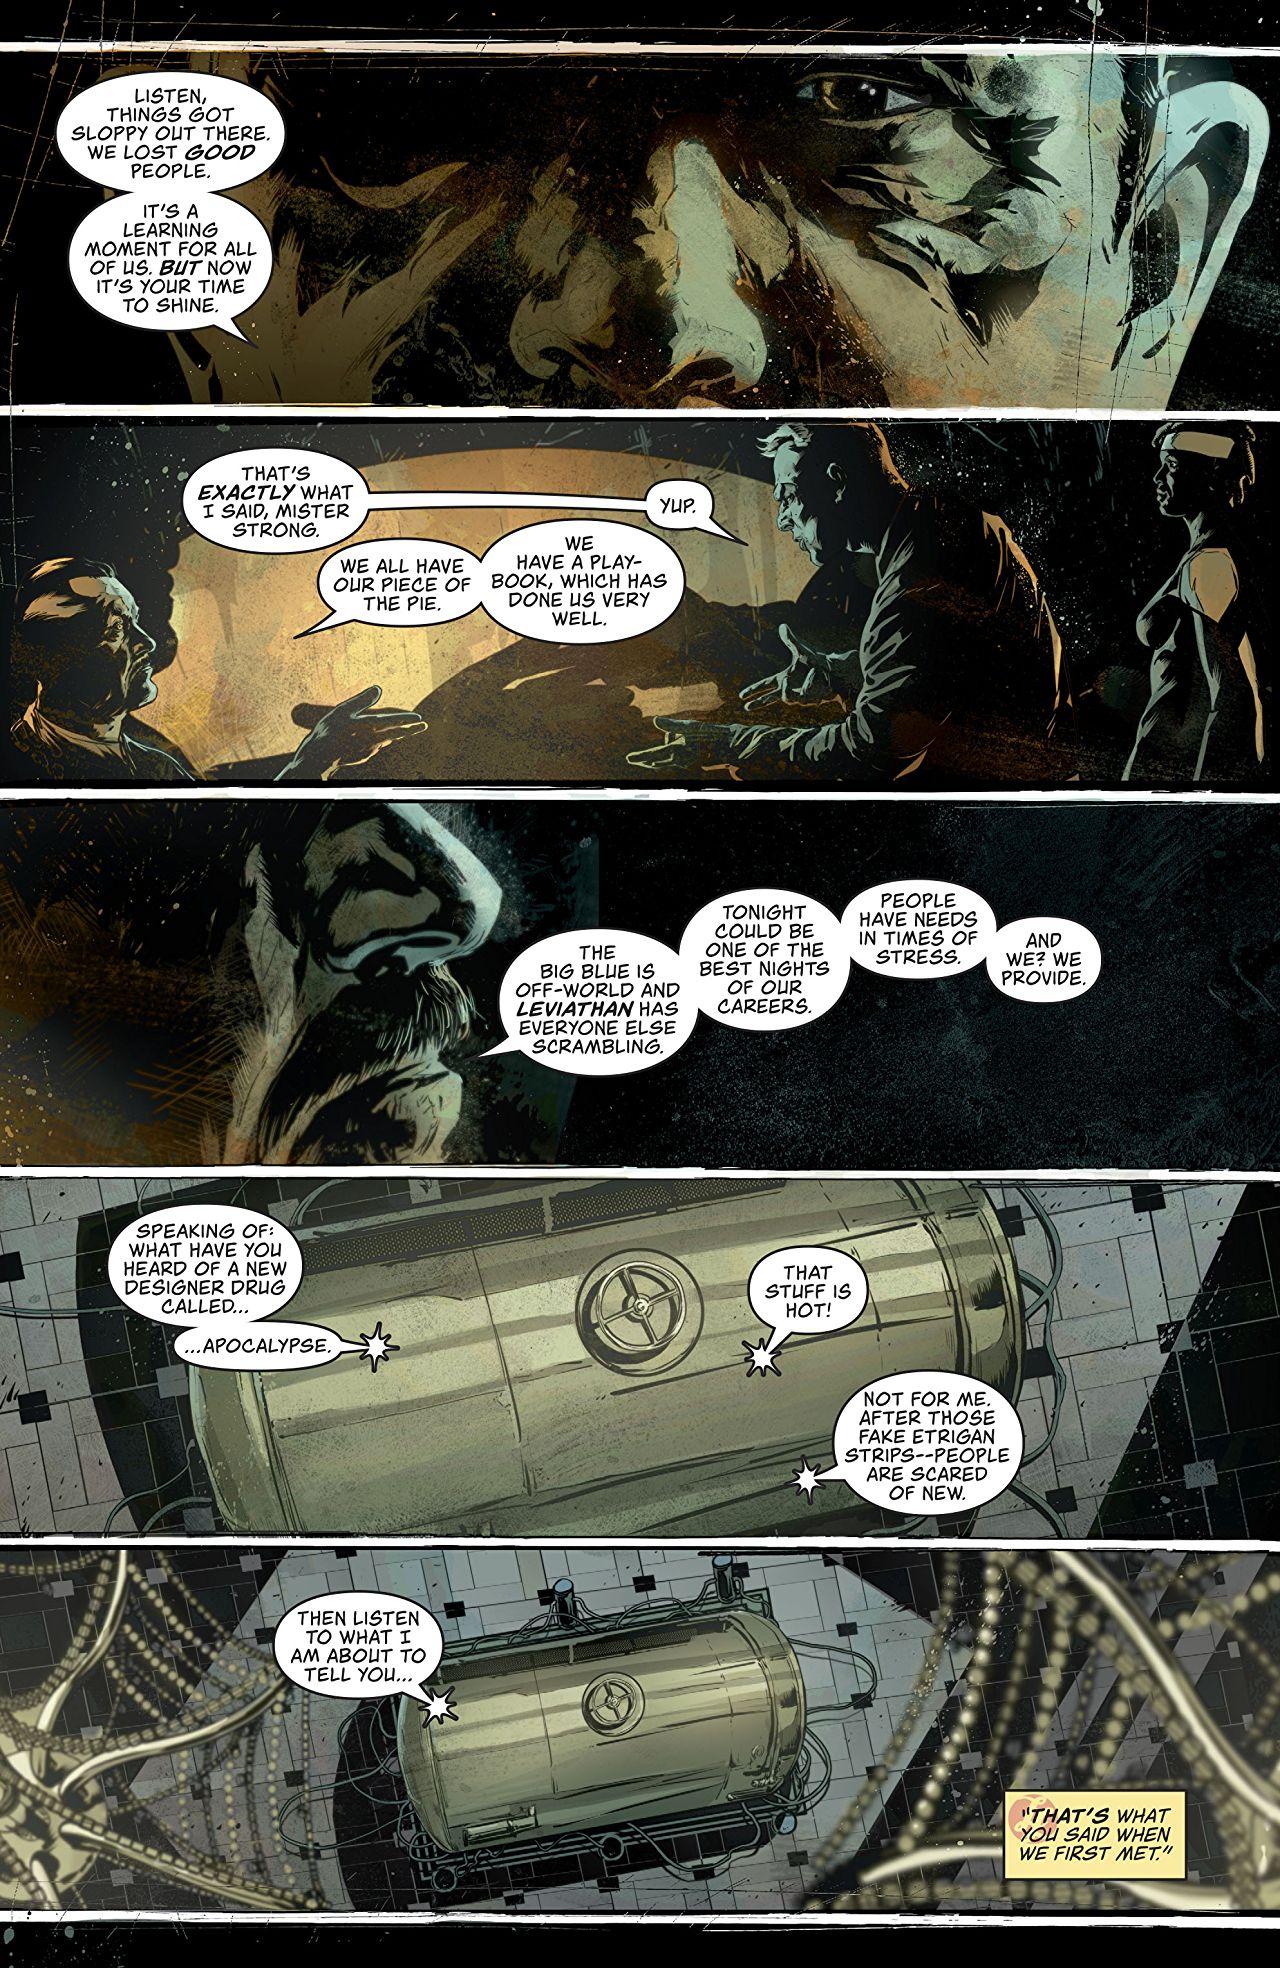 Action Comics 1012 3.jpg